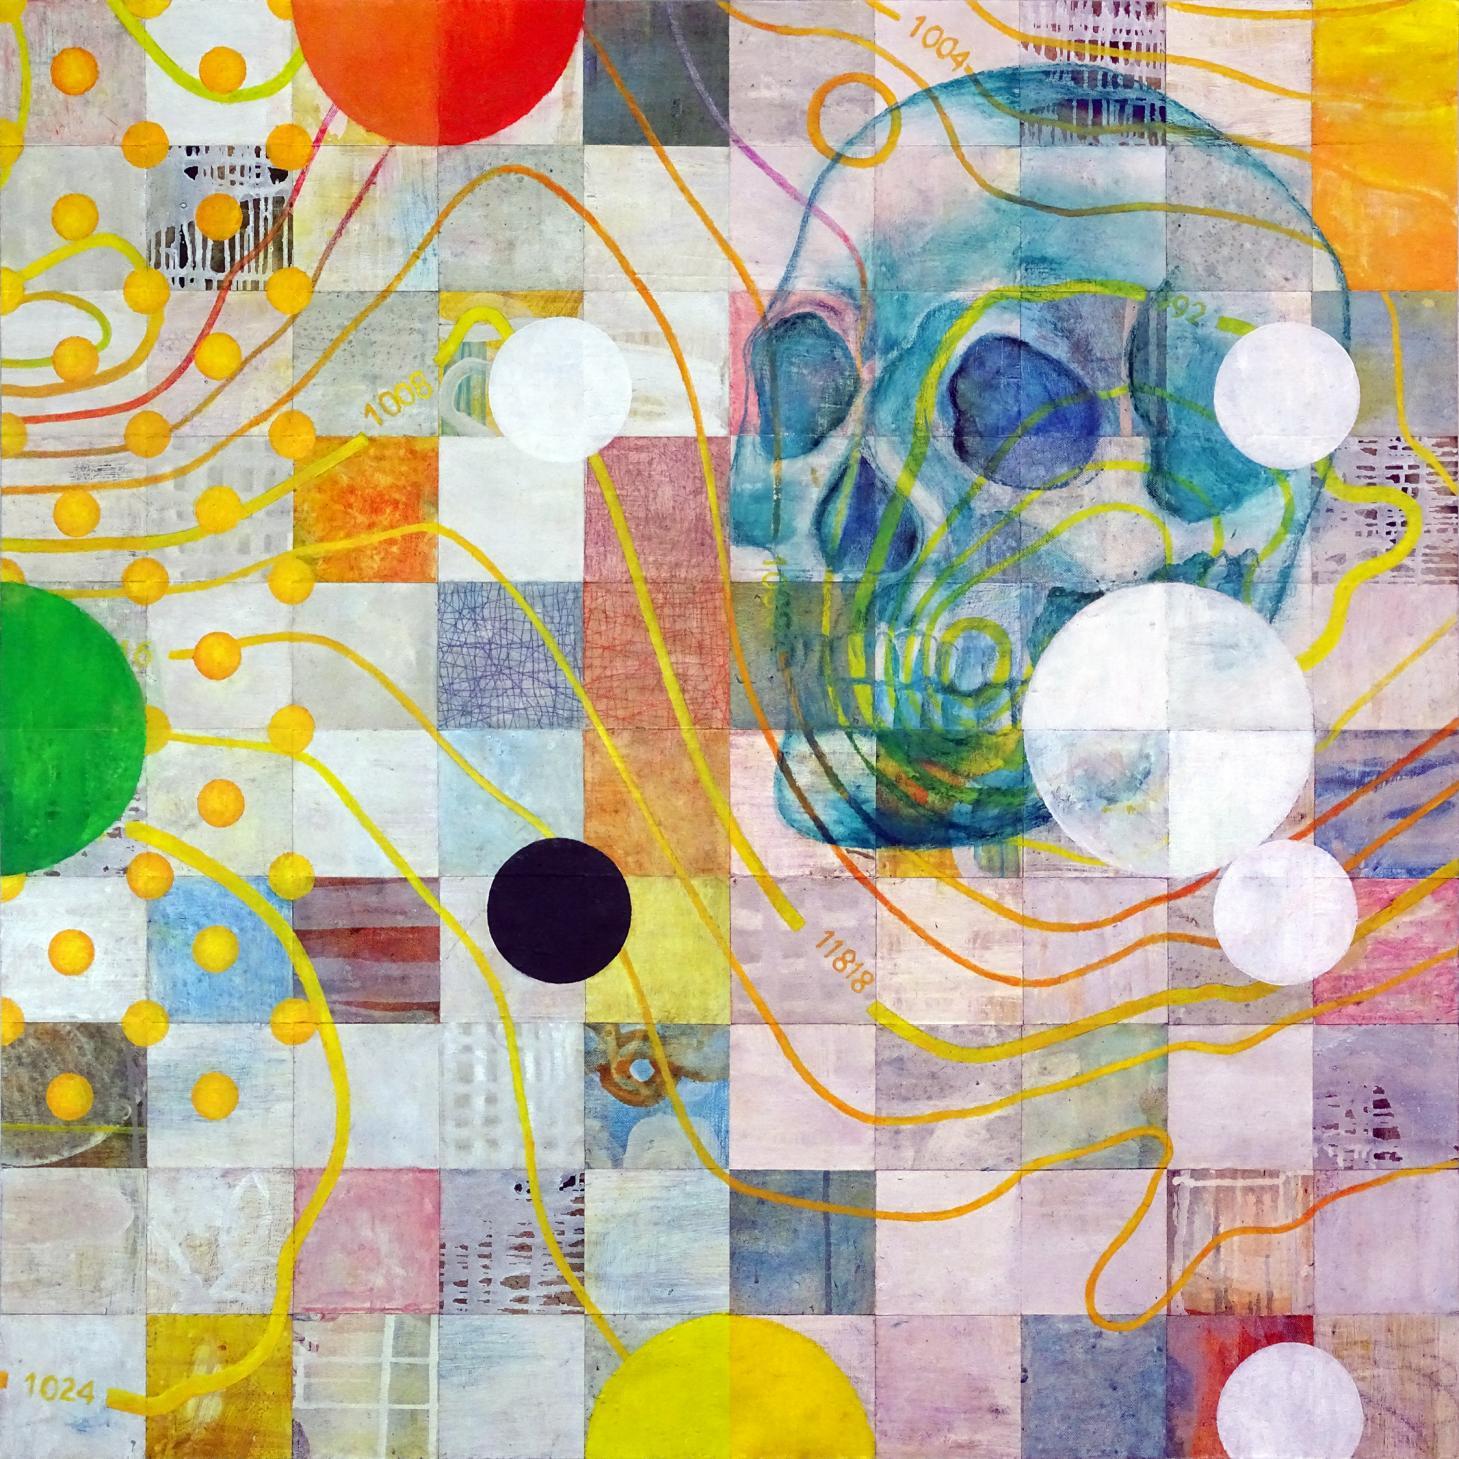 ISOBARAS Y CALAVERA (isobars and skull) (2019) - Carles Guitart Esteve